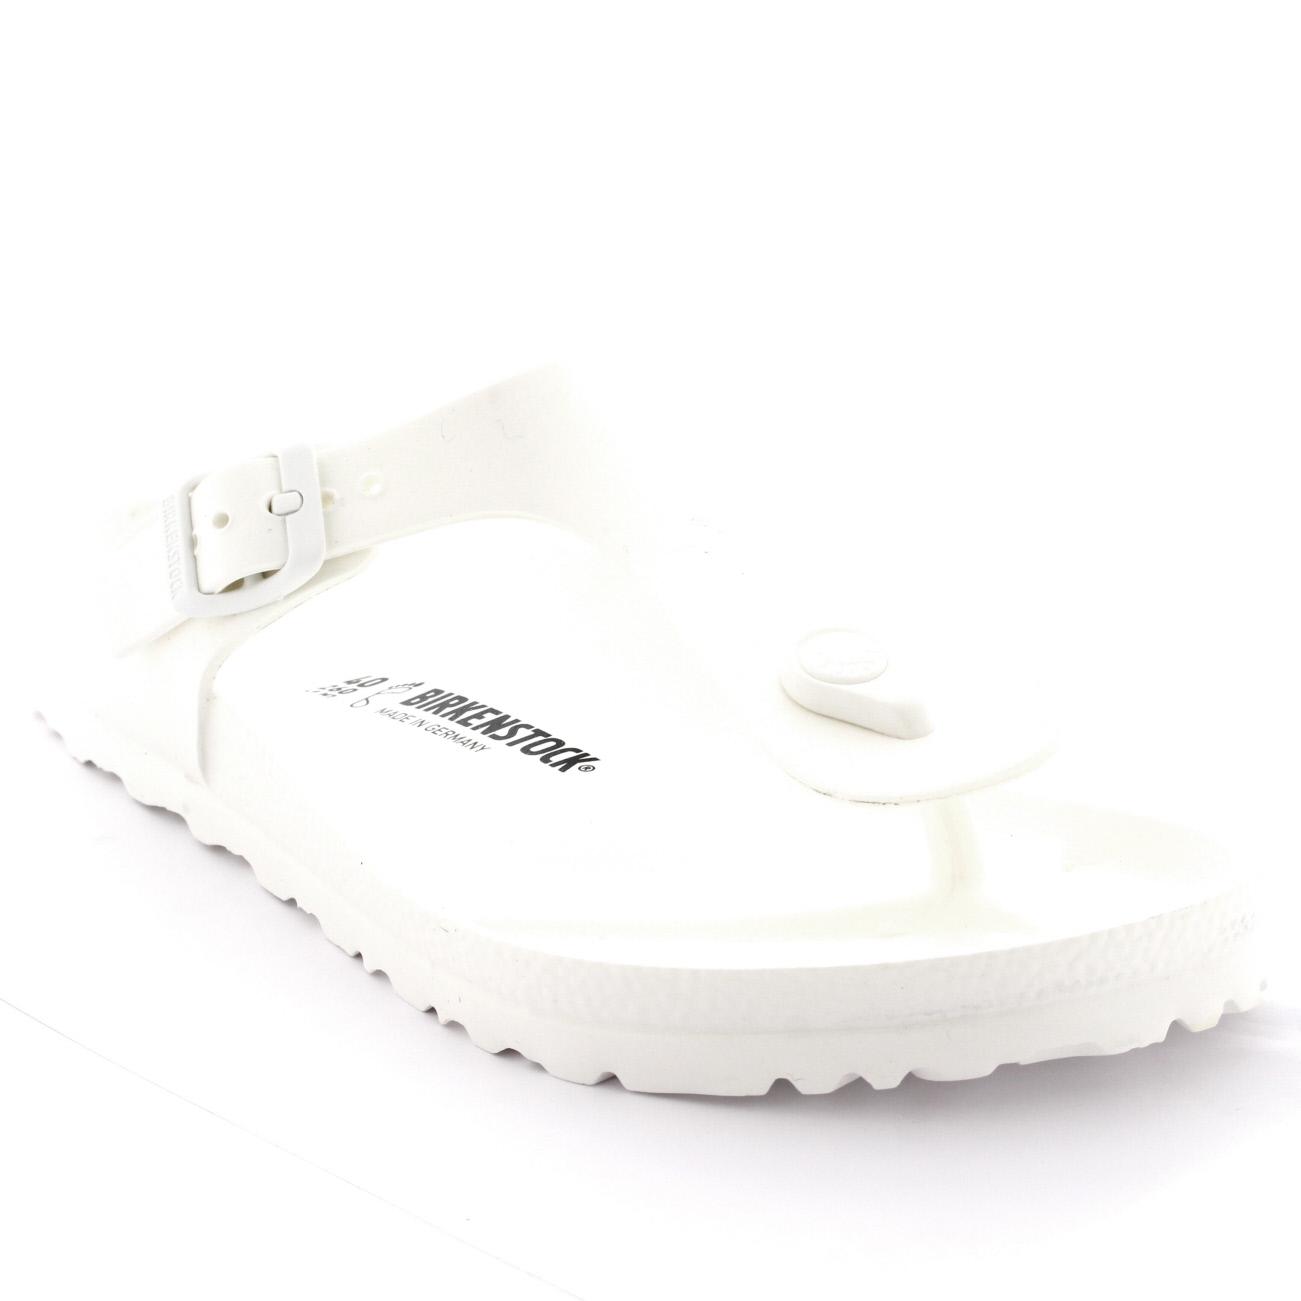 Unisex-Adults-Birkenstock-Gizeh-Summer-EVA-Toe-Post-Beach-Flat-Sandals-All-Sizes thumbnail 19